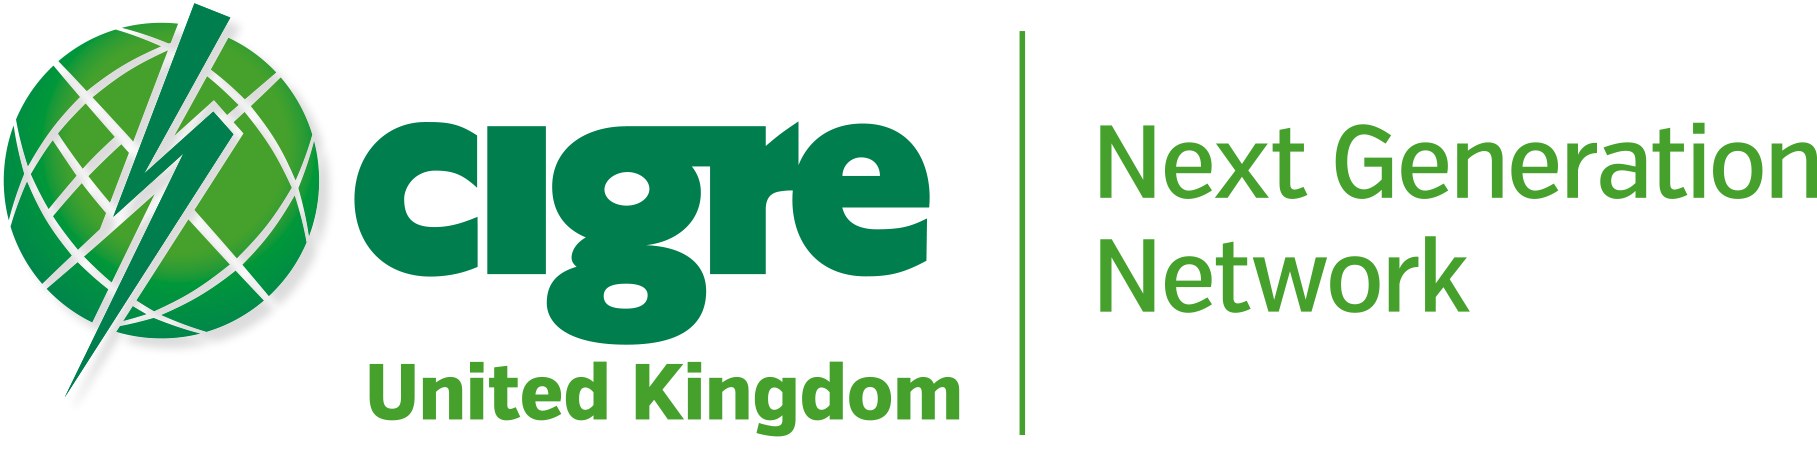 CIGRE_NGN_United Kingdom